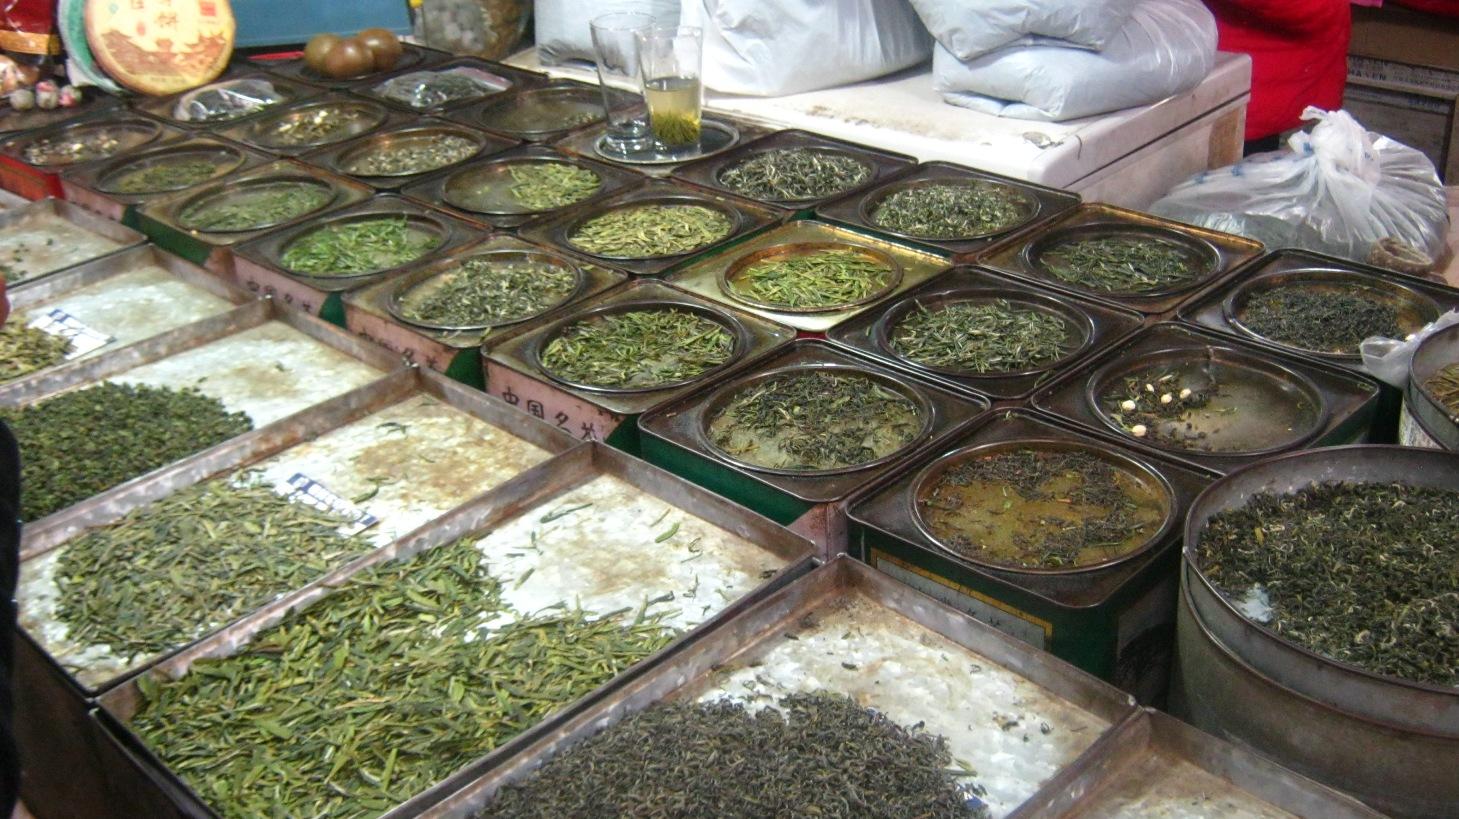 Прилавок с чаем на рынке в Шанхае. Фото: ahungryafrican.wordpress.com